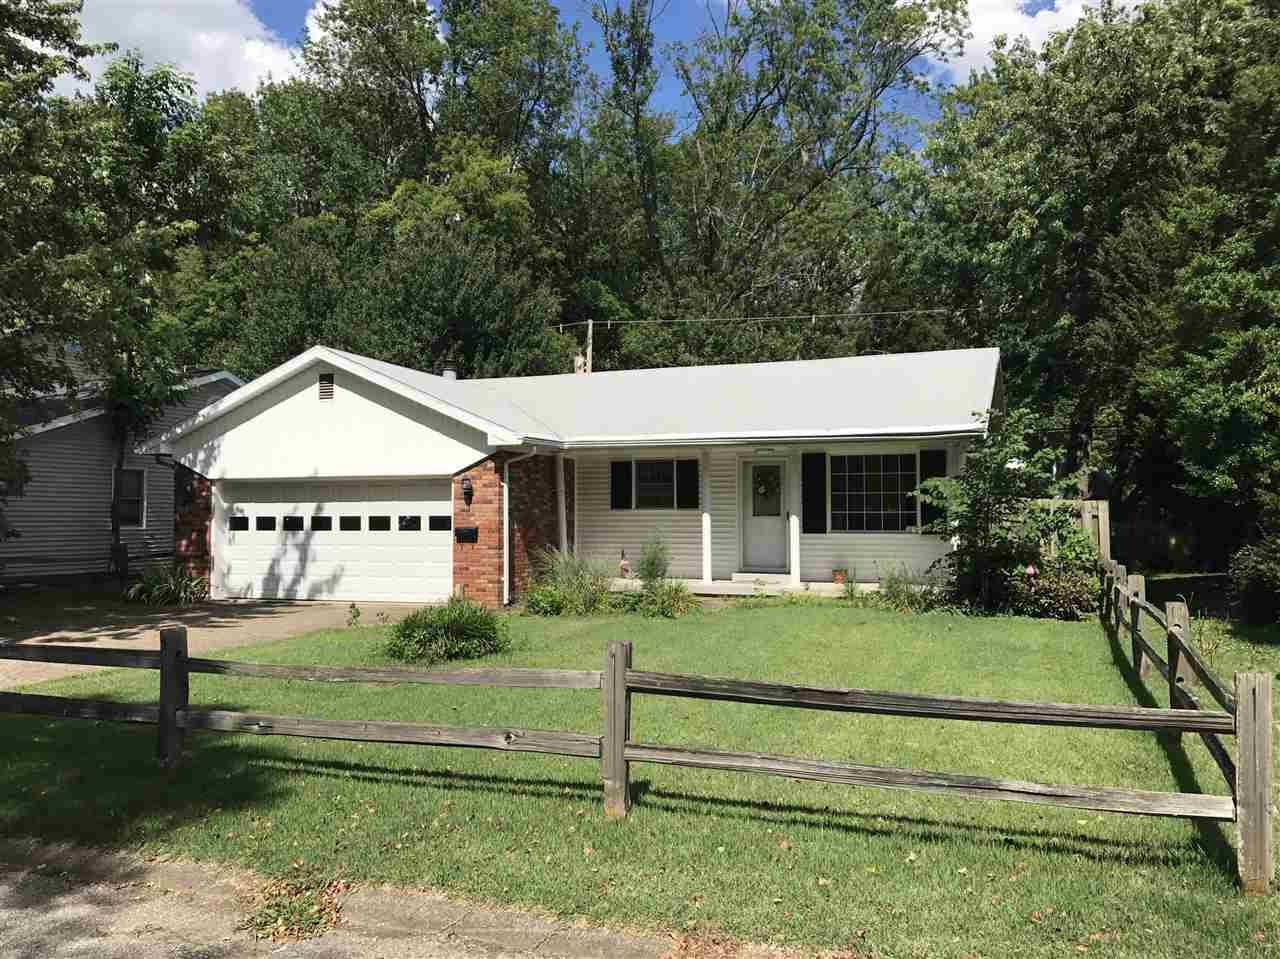 662 Audubon Drive, Evansville, IN 47715